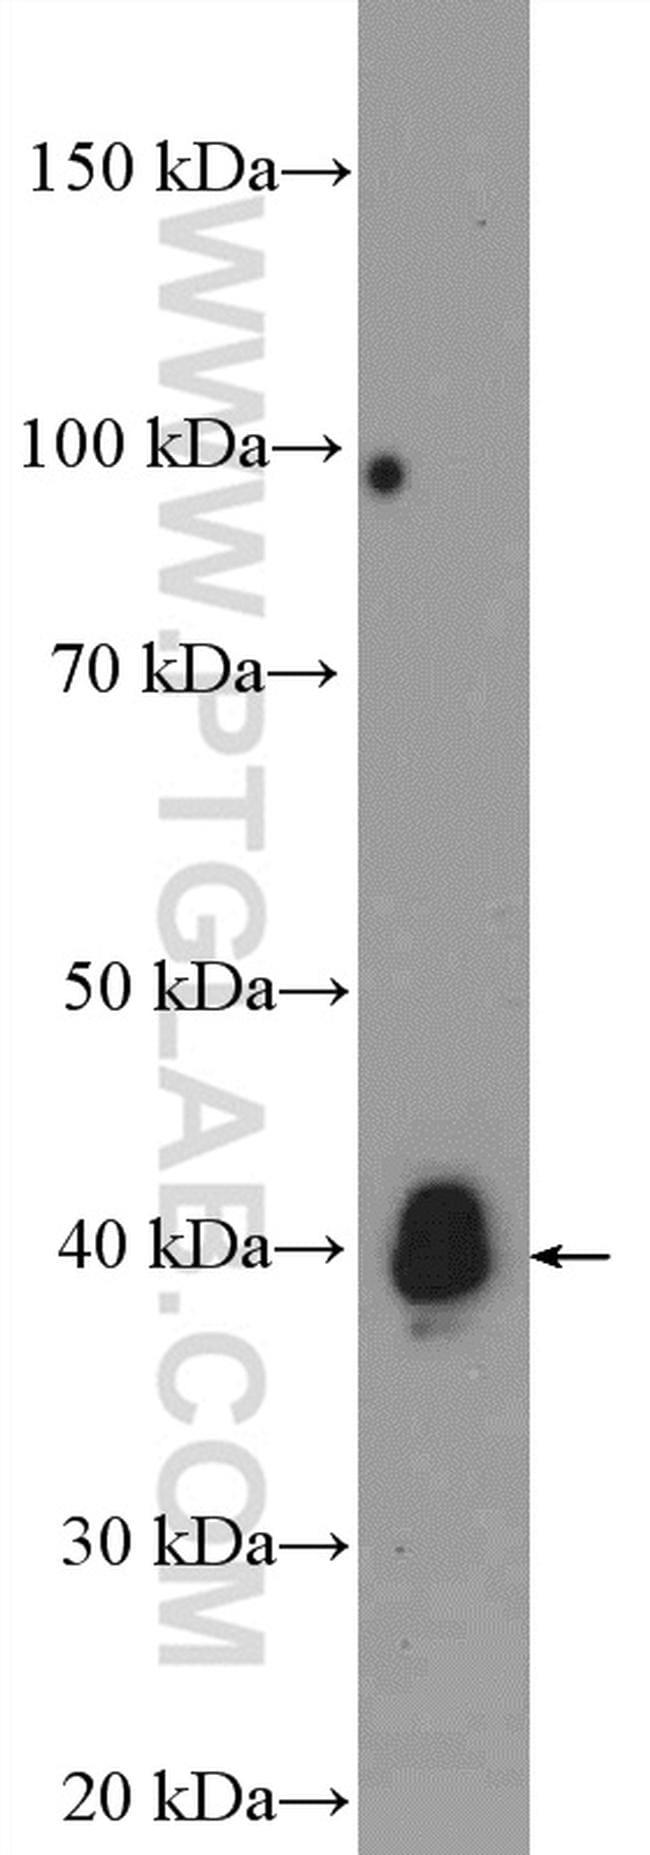 HNRNPD Antibody in Western Blot (WB)